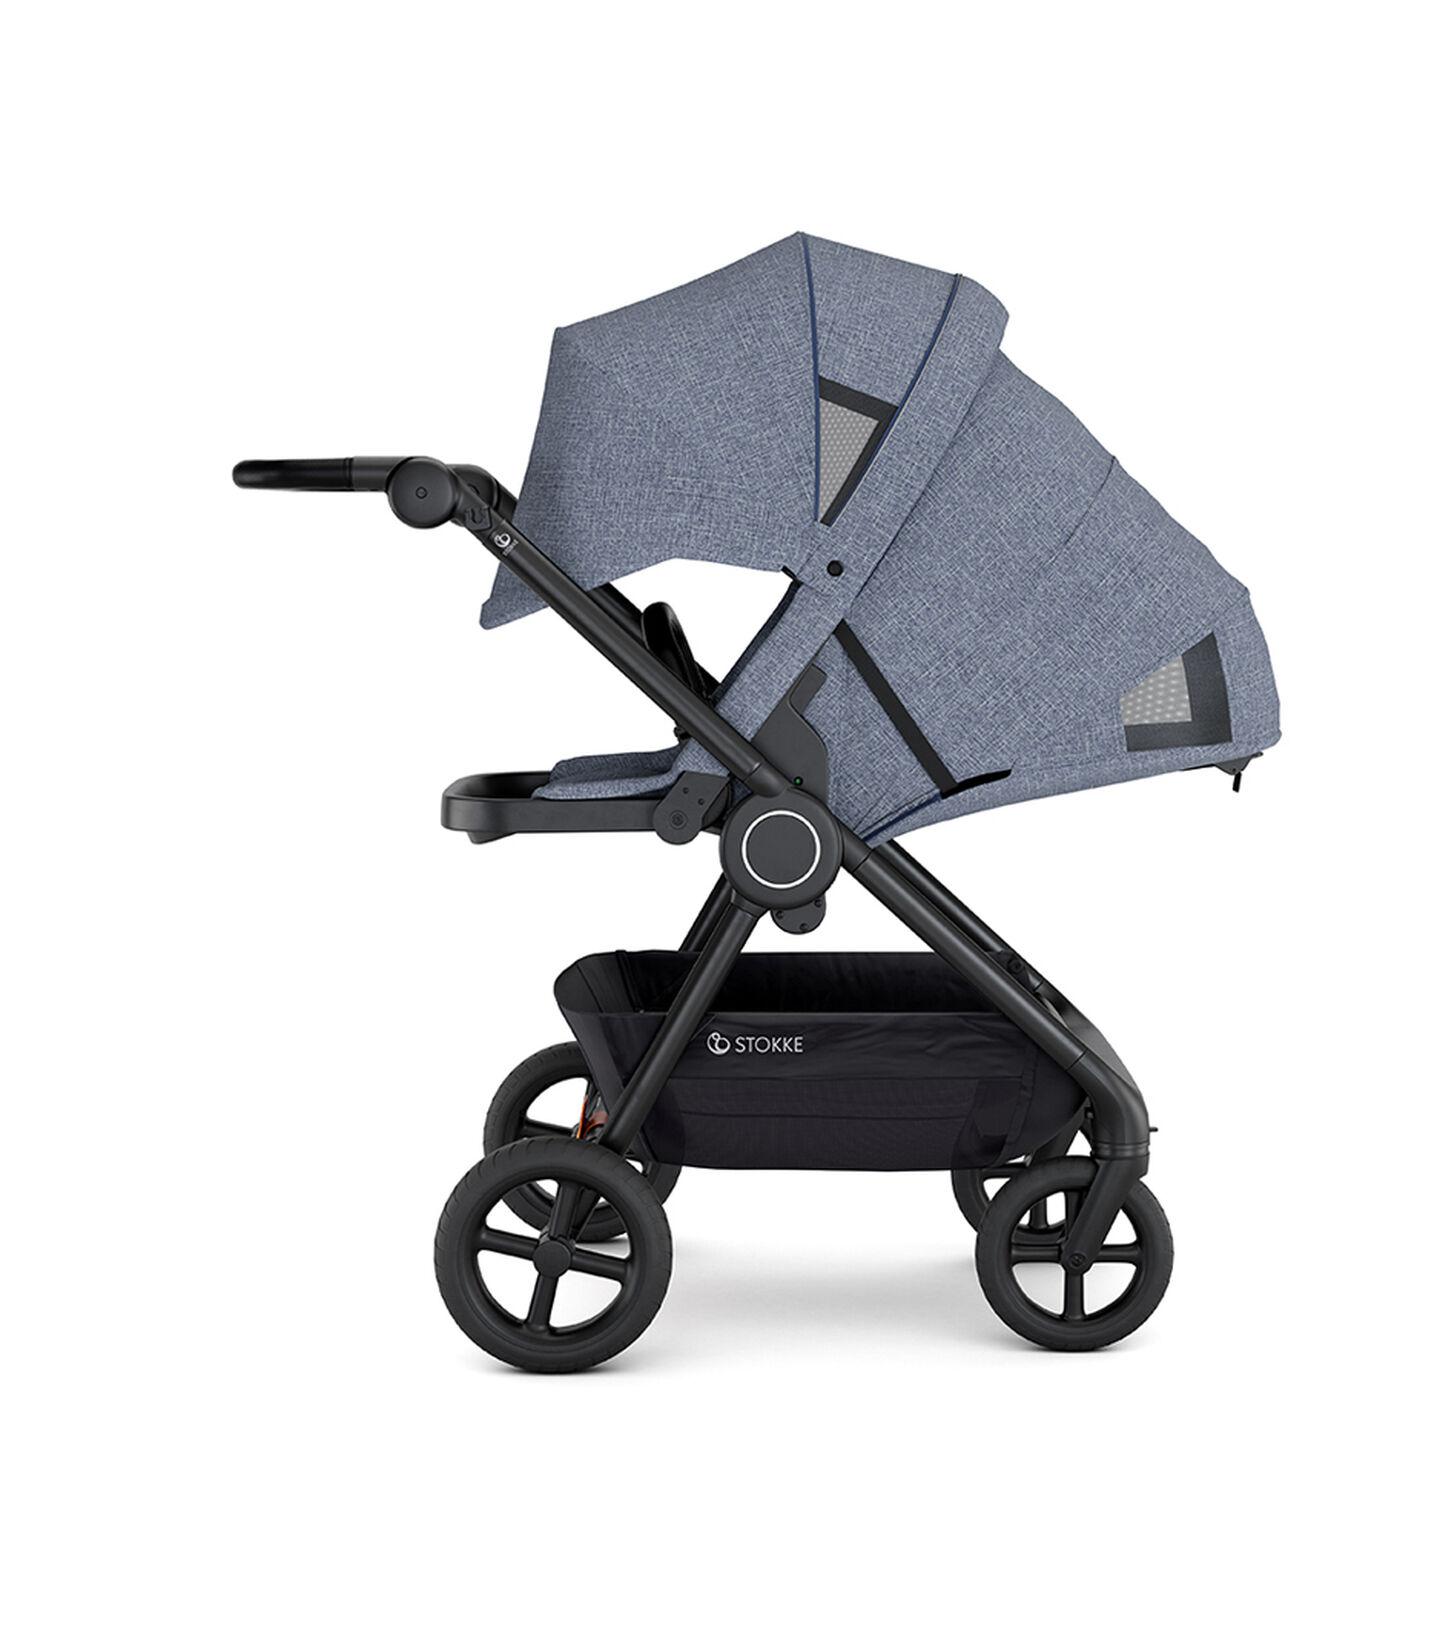 Stokke® Beat™ with Seat. Blue Melange. Parent facing. Sleep position.